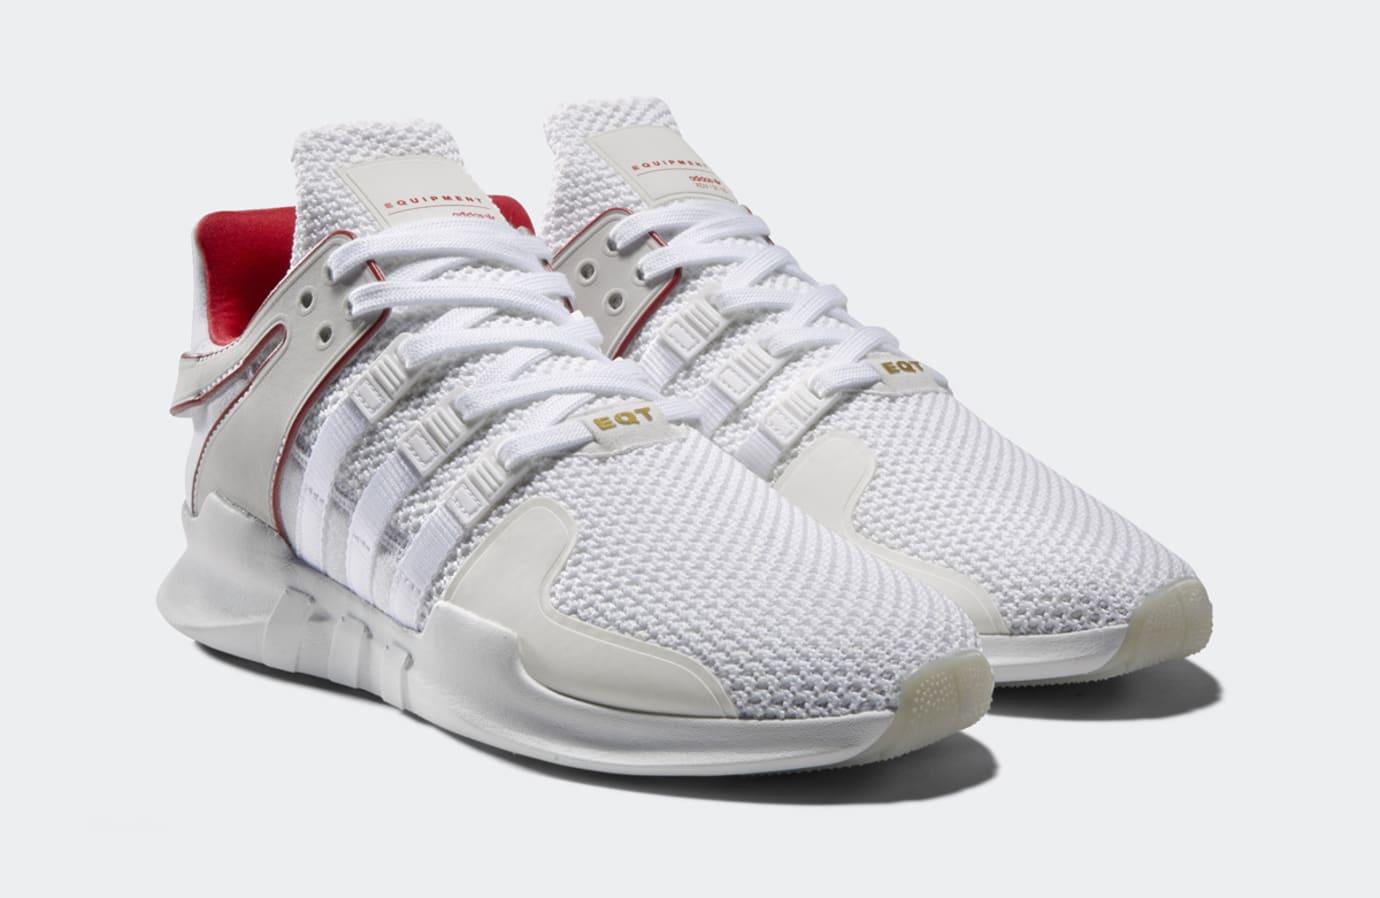 Adidas Chinese New Year EQT ADV 2